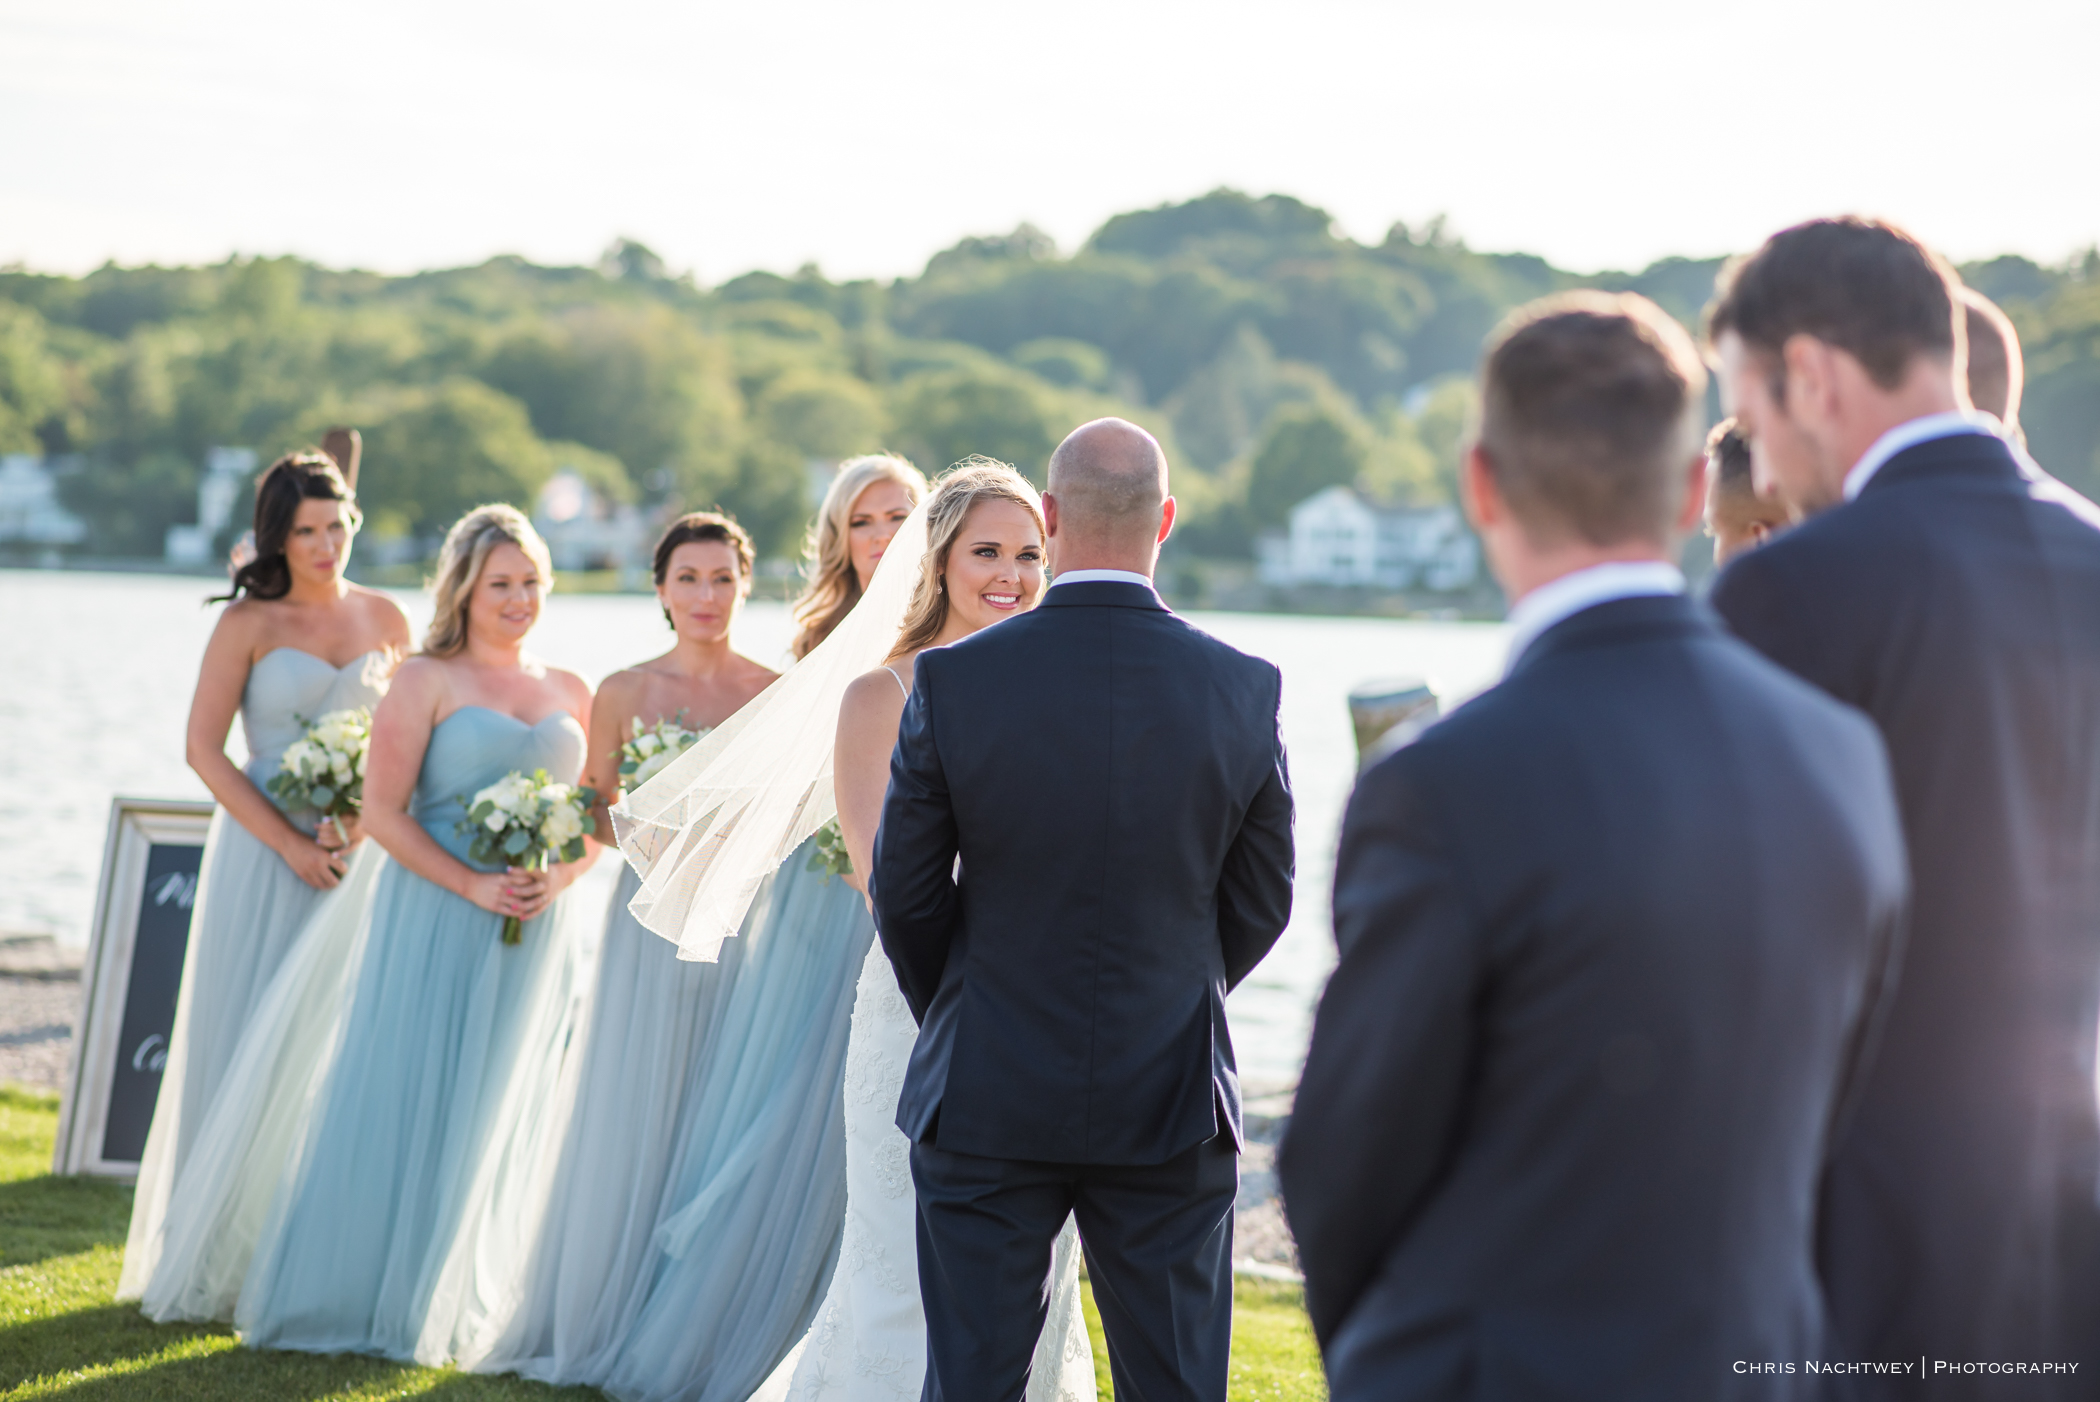 mystic-ct-artistic-wedding-photographers-chris-nachtwey-tany-mike-2017-35.jpg